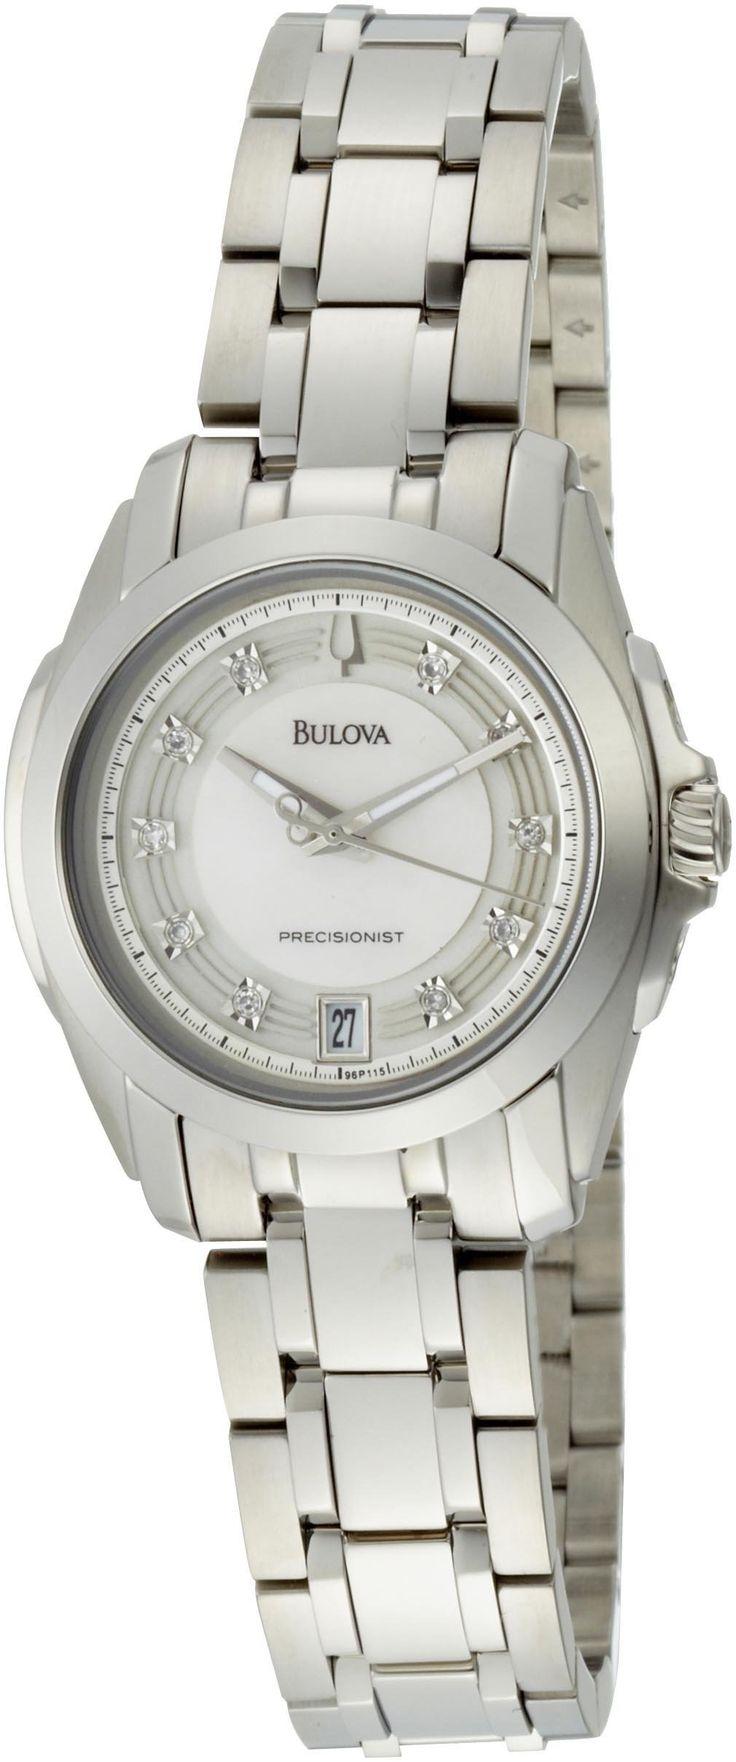 Amazon.com: Bulova Women's 96P115 Precisionist Longwood Diamond MOP Dial Steel Bracelet Watch: Bulova: Clothing